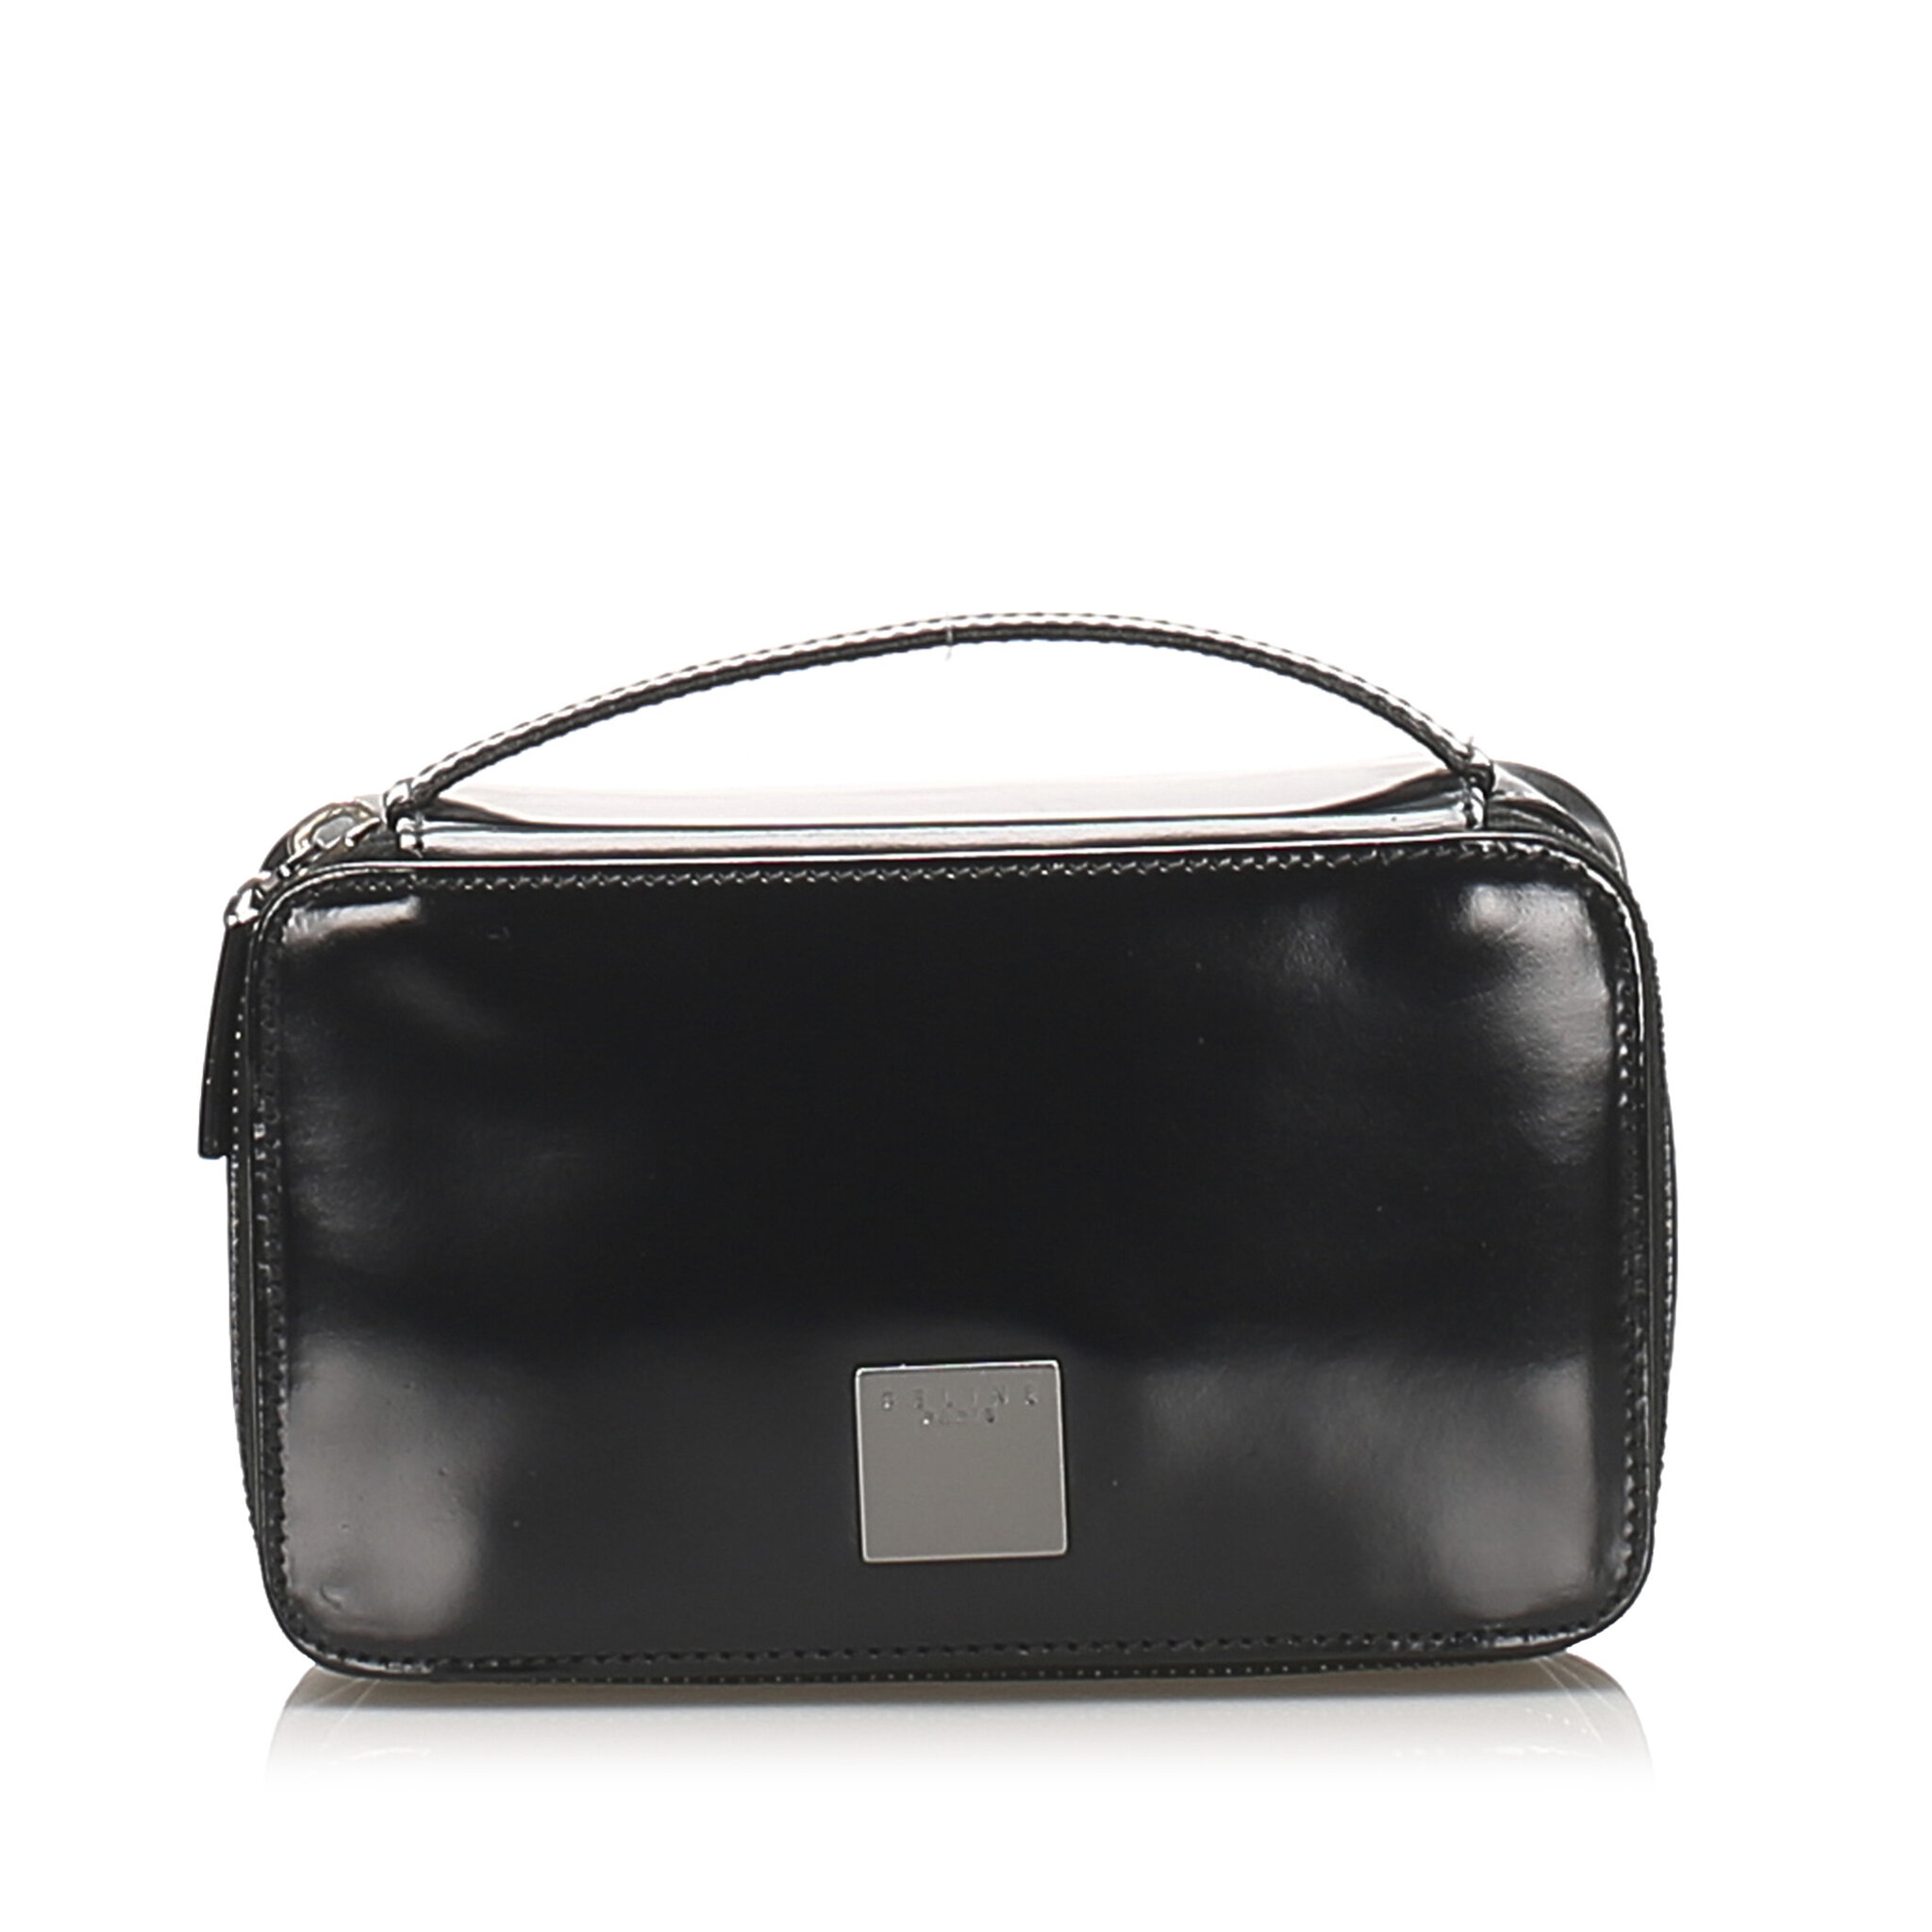 Celine Patent Leather Vanity Bag